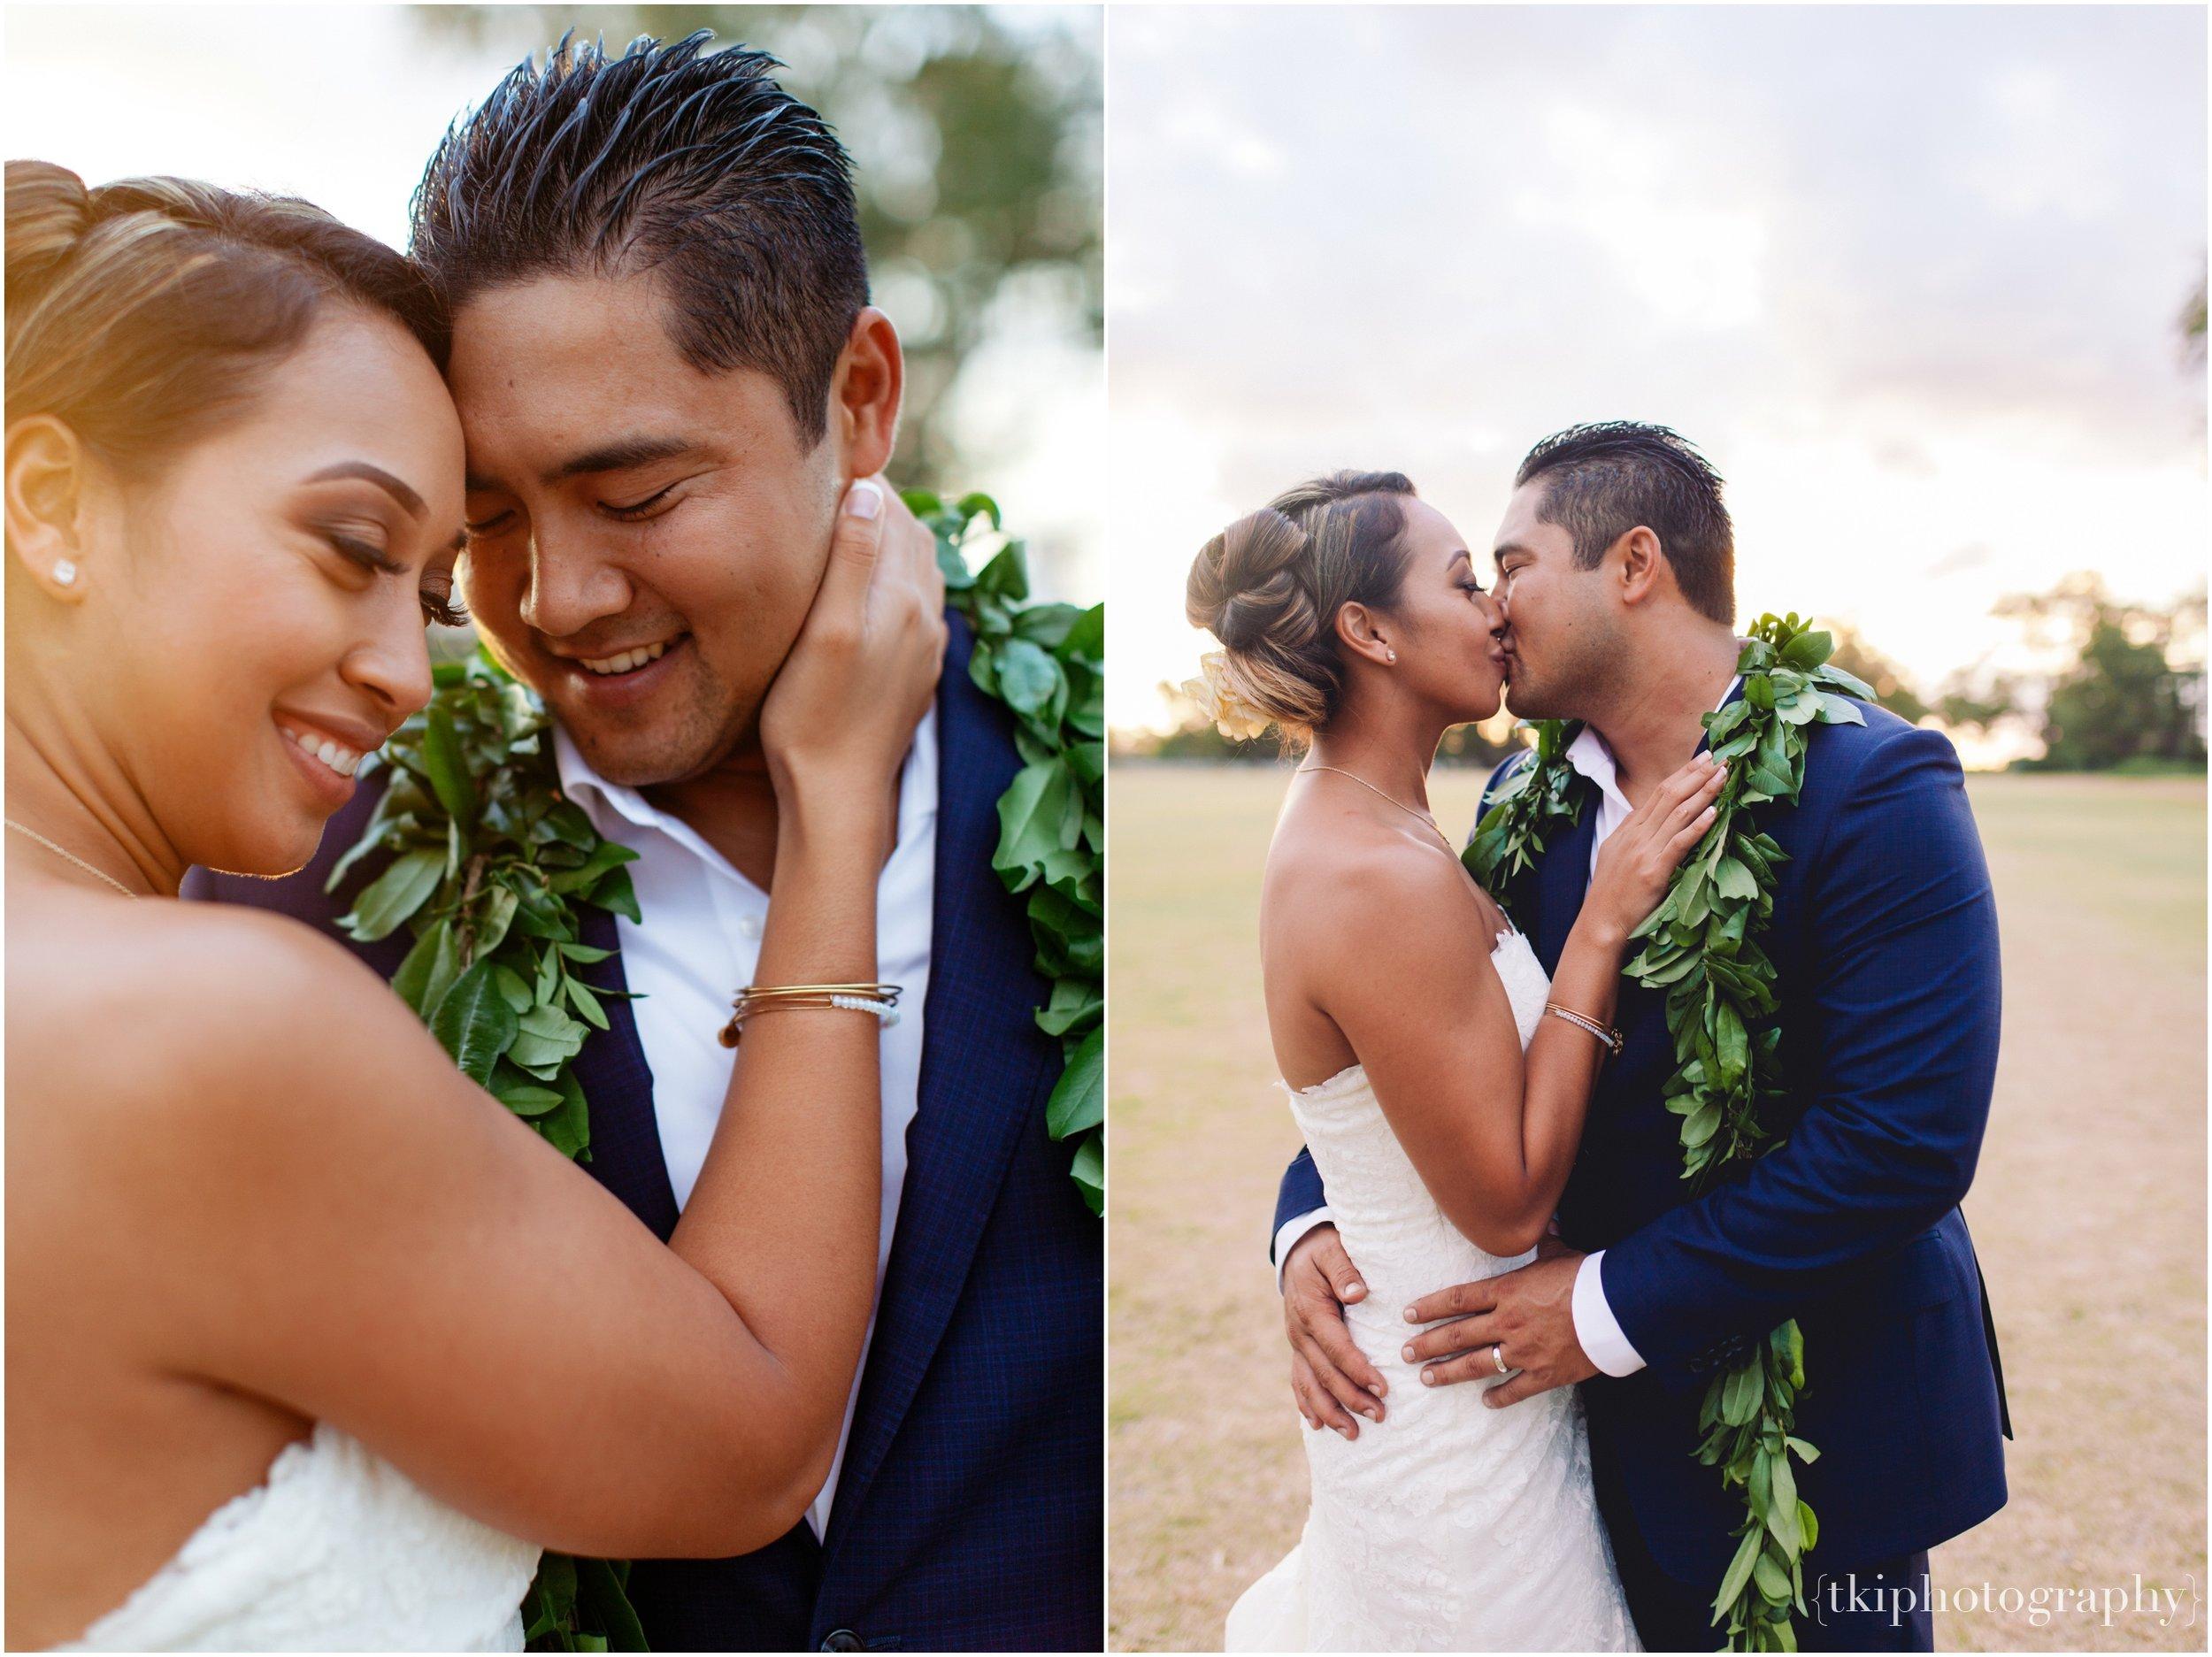 Oahu-Destination-Wedding-Beach_0114.jpg